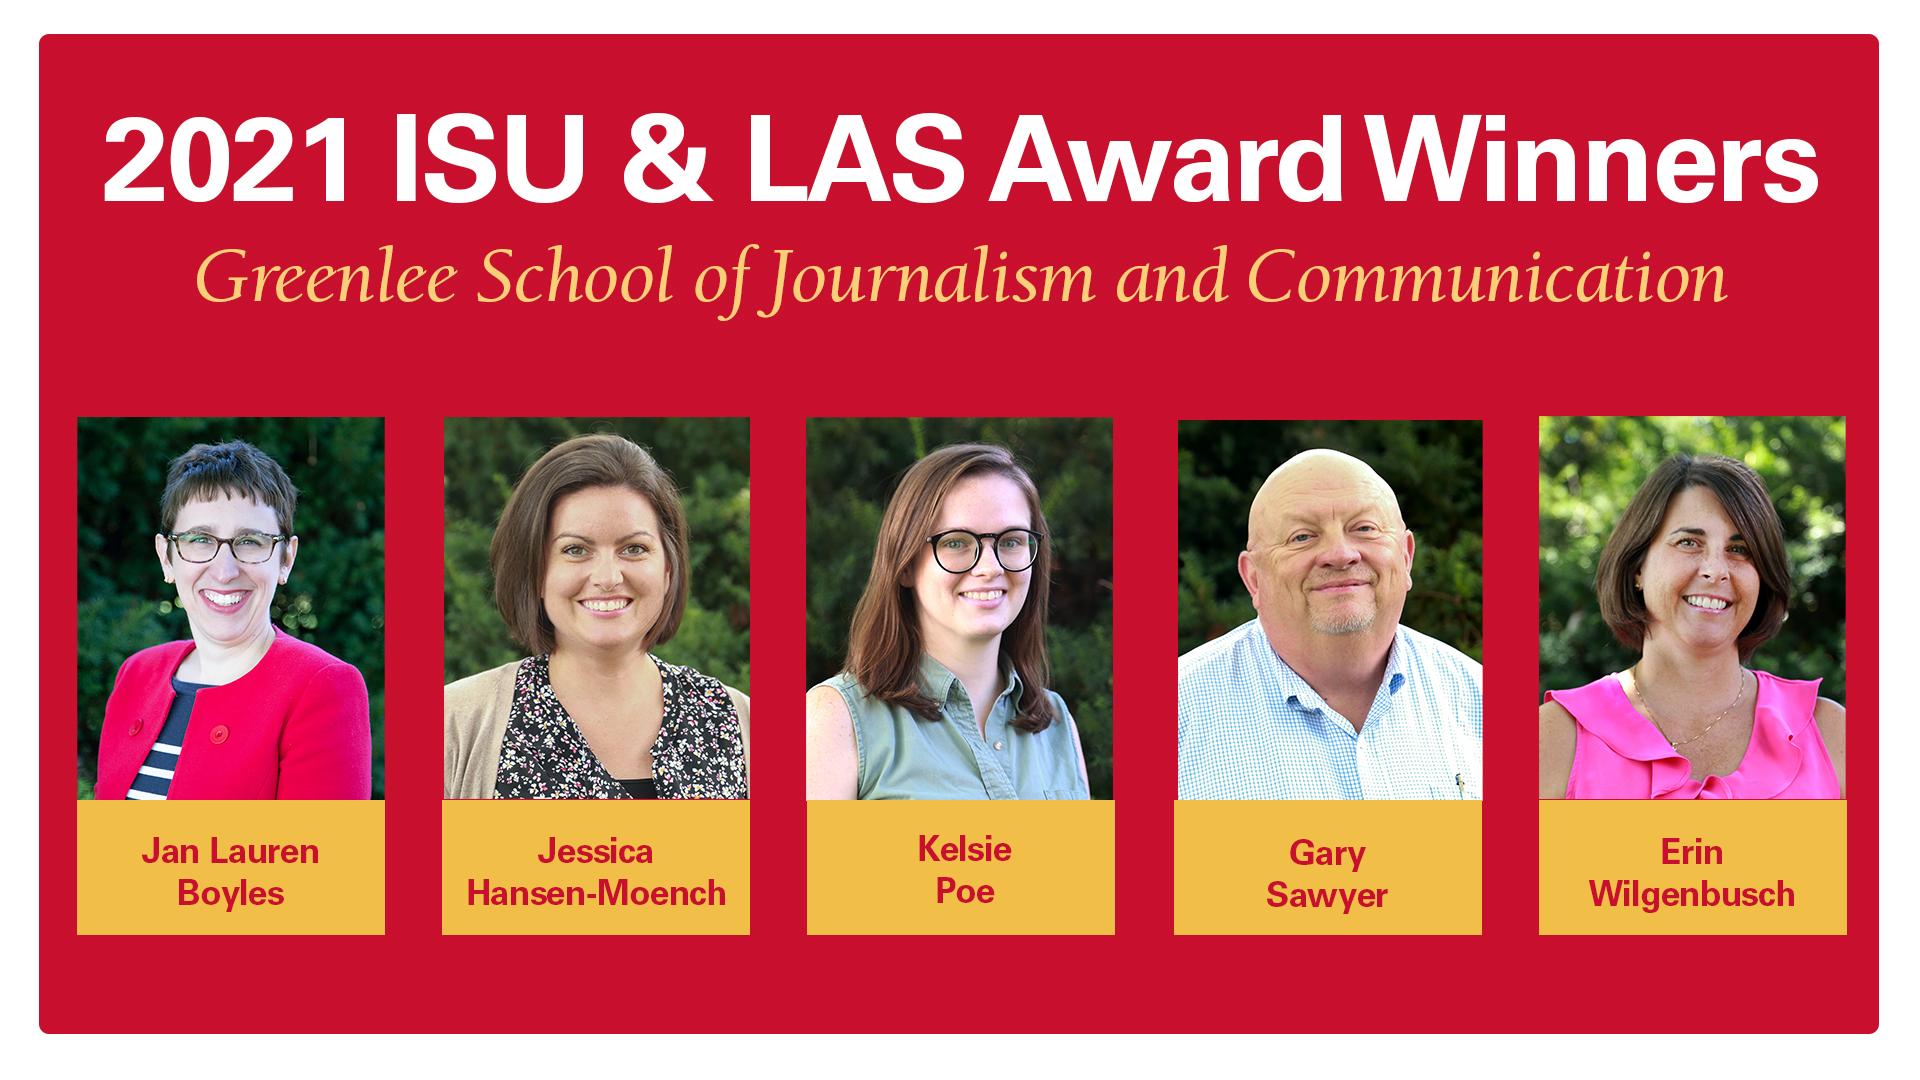 2021 LAS Award winners